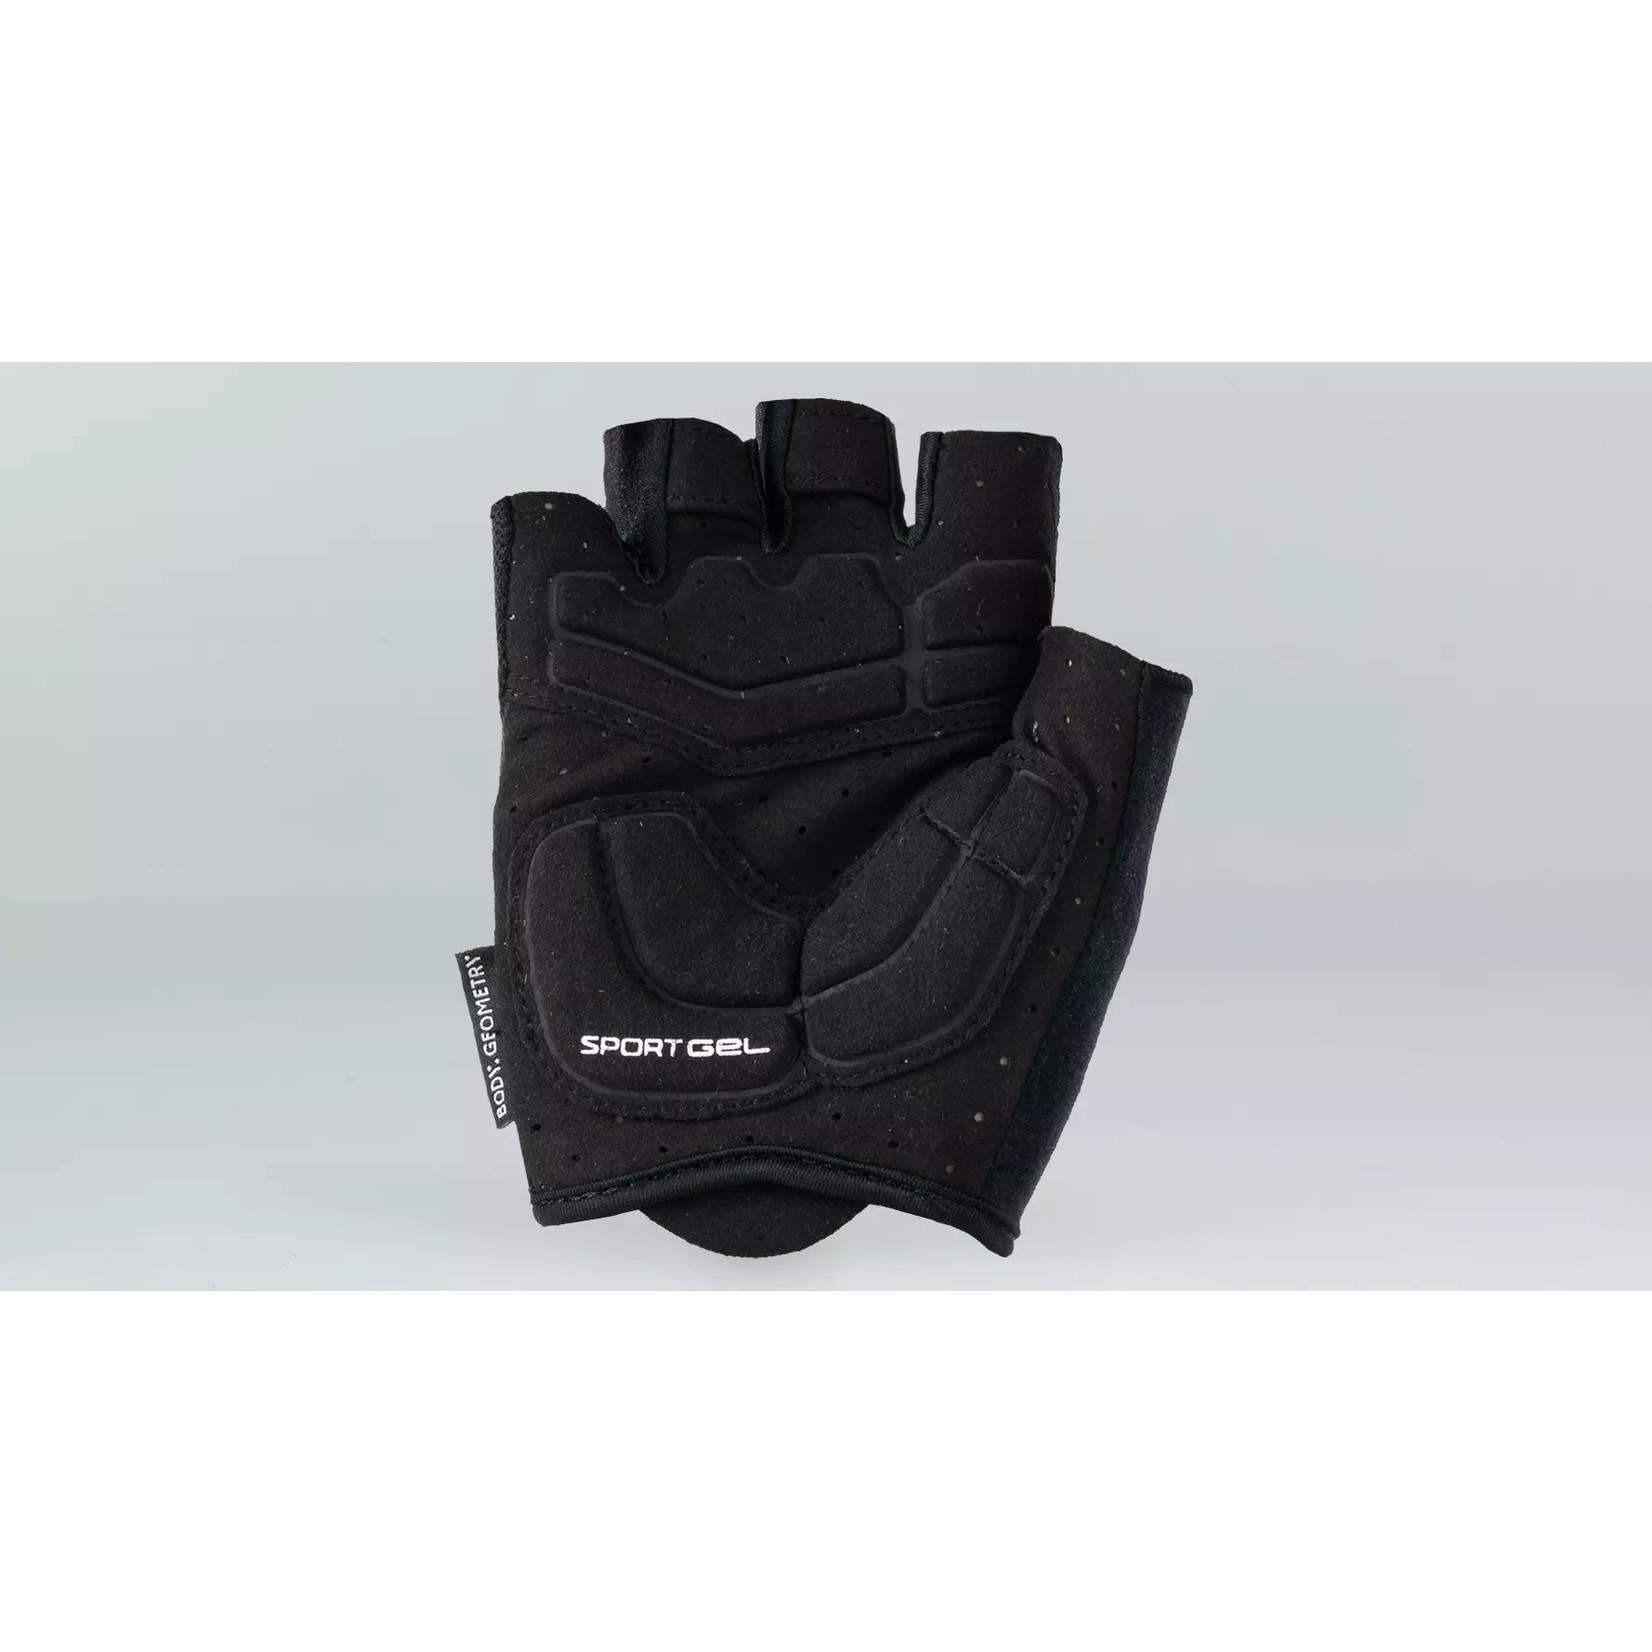 Specialized Specialized Men's Body Geometry Sport Gel Gloves